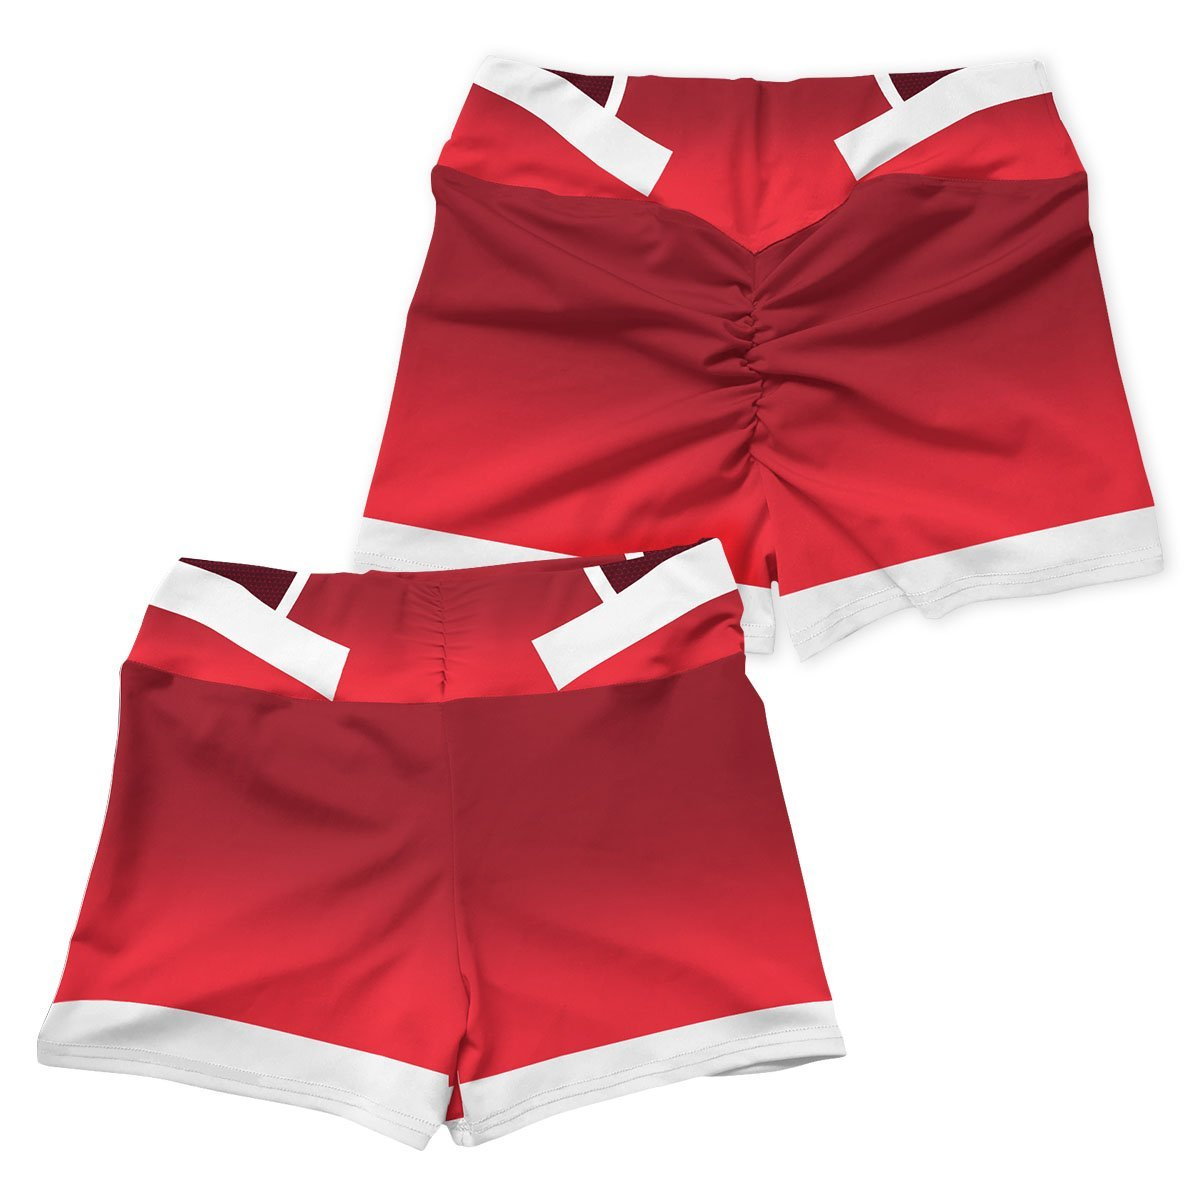 zero two armor suit active wear set 737336 - Anime Swimsuits